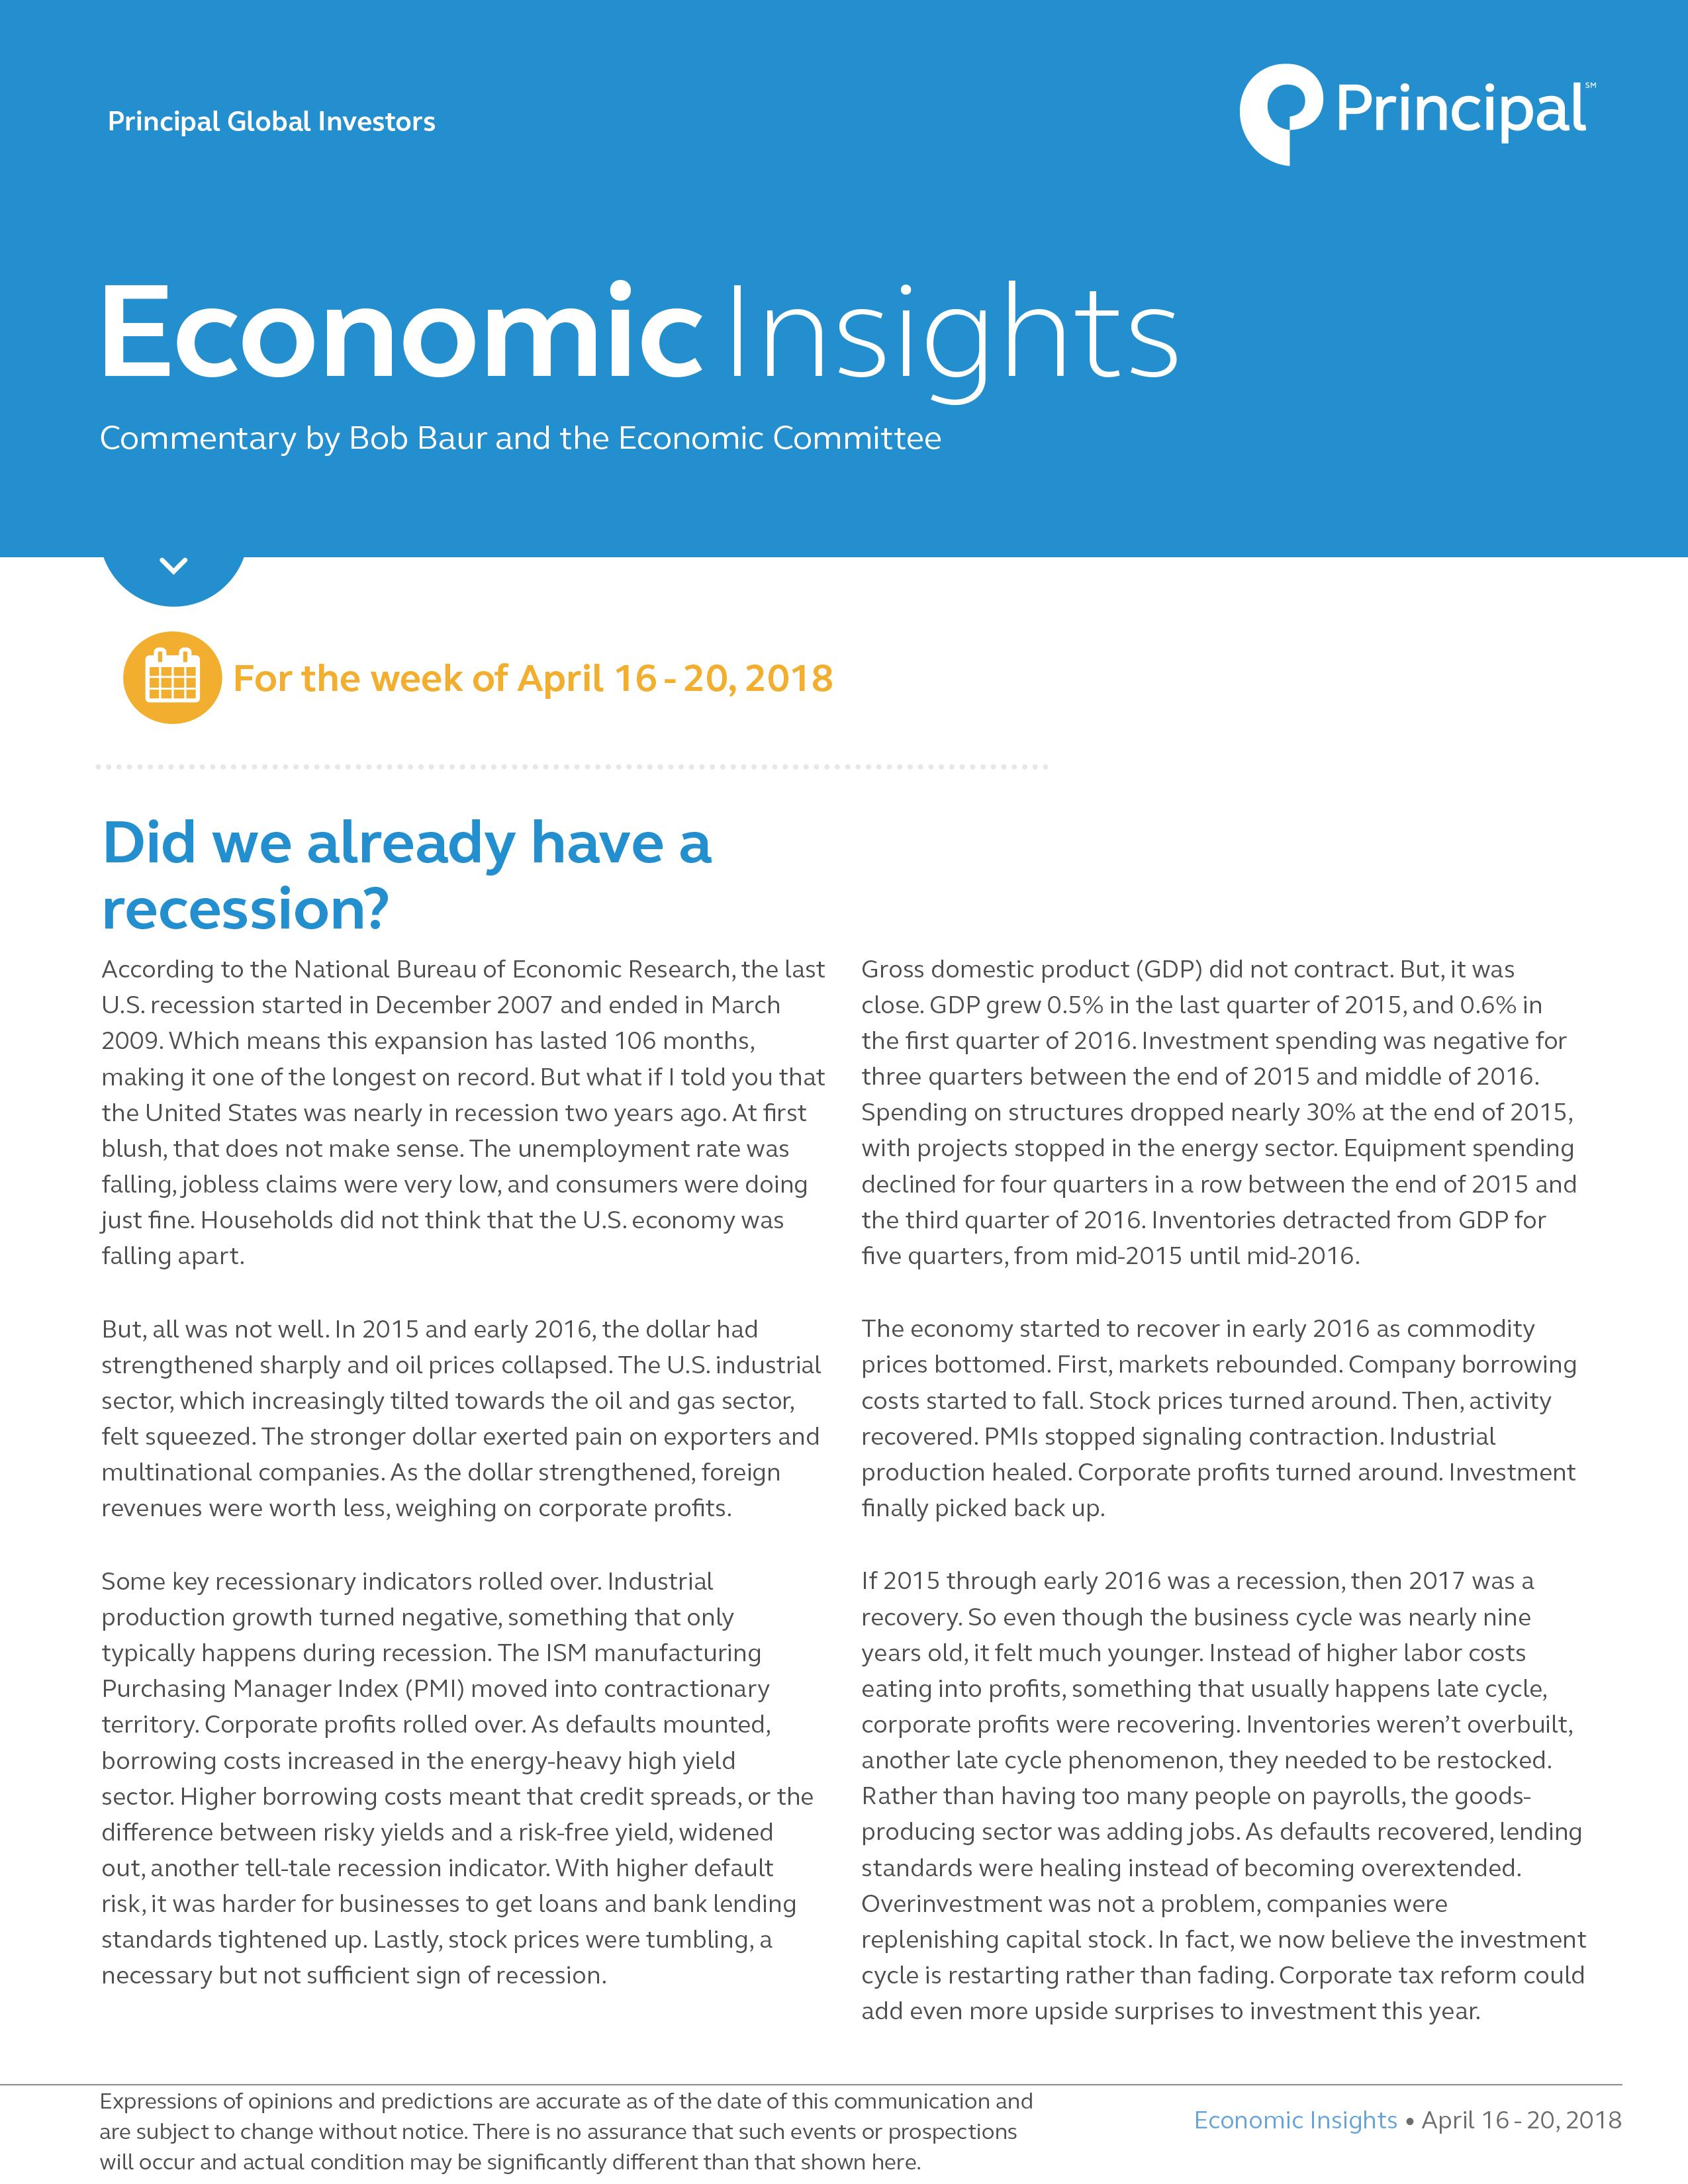 Economic Insights for April 16 - 20